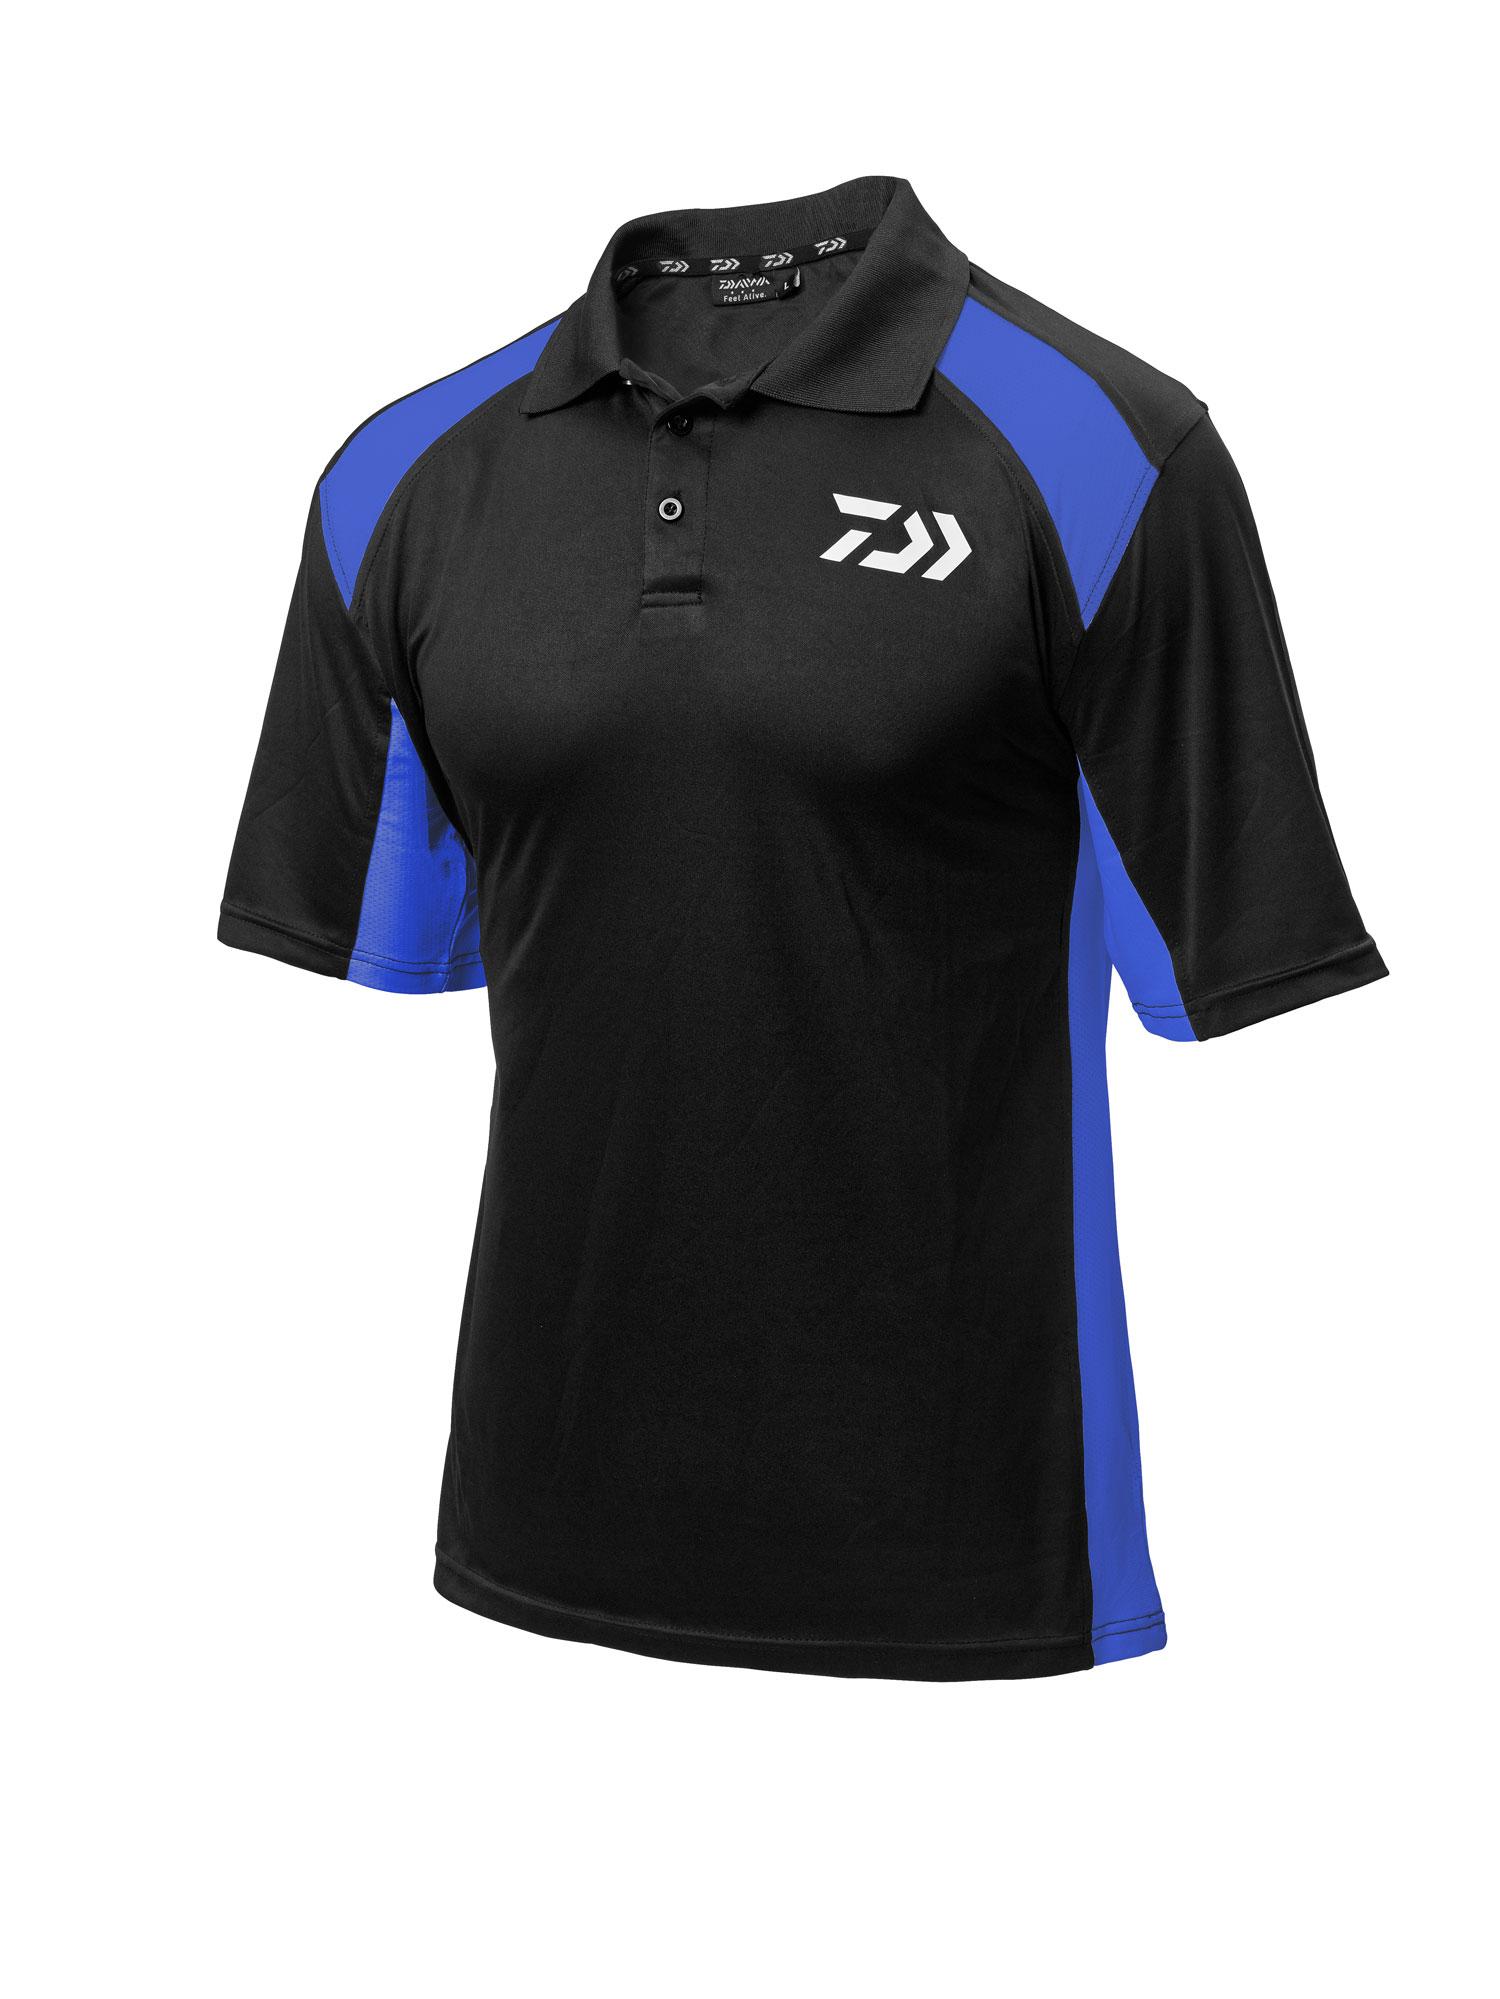 New Daiwa Polo Shirts Black Red Black White Black